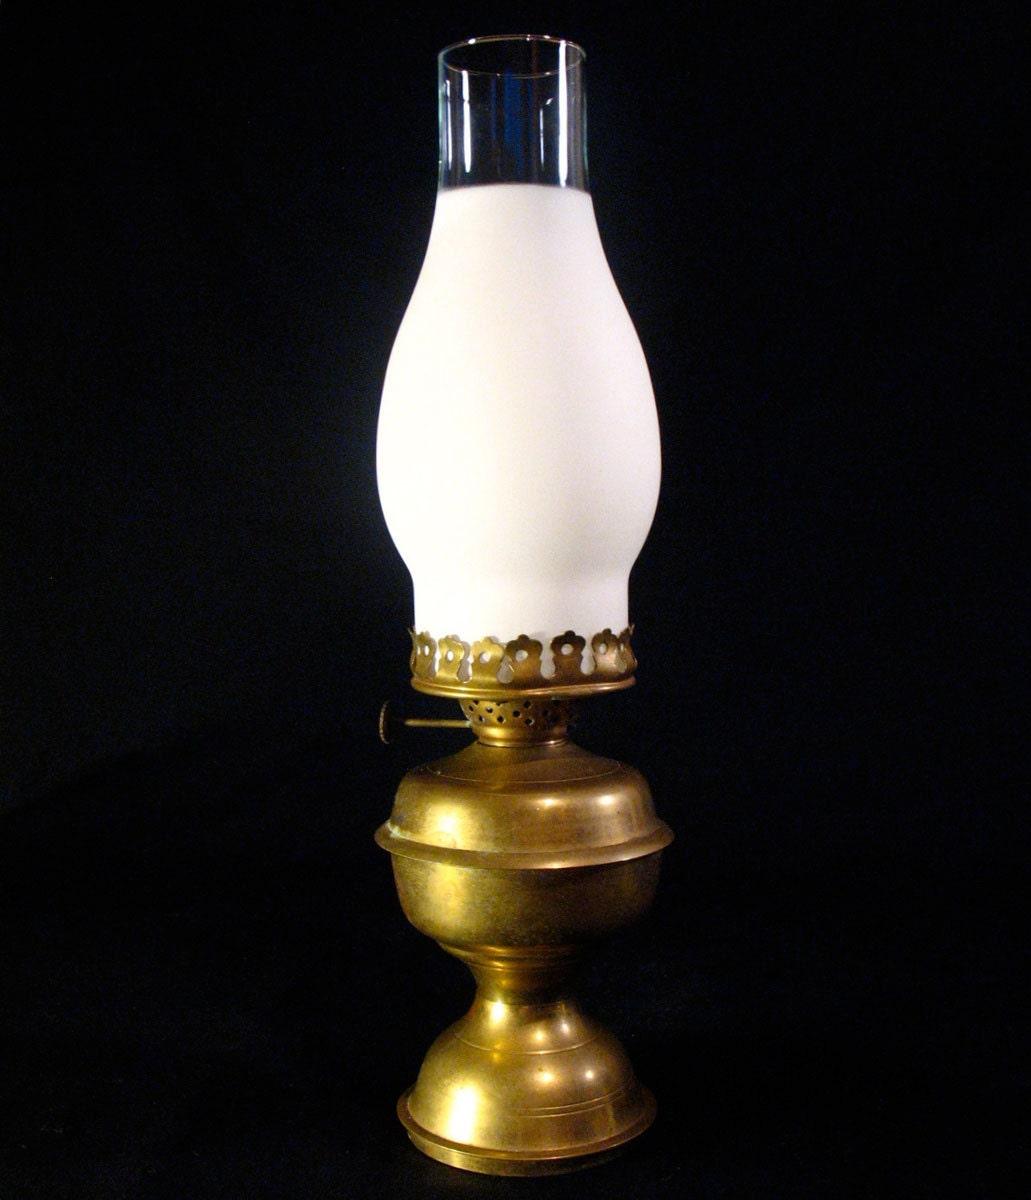 vintage brass oil lamp glass hurricane chimney by. Black Bedroom Furniture Sets. Home Design Ideas